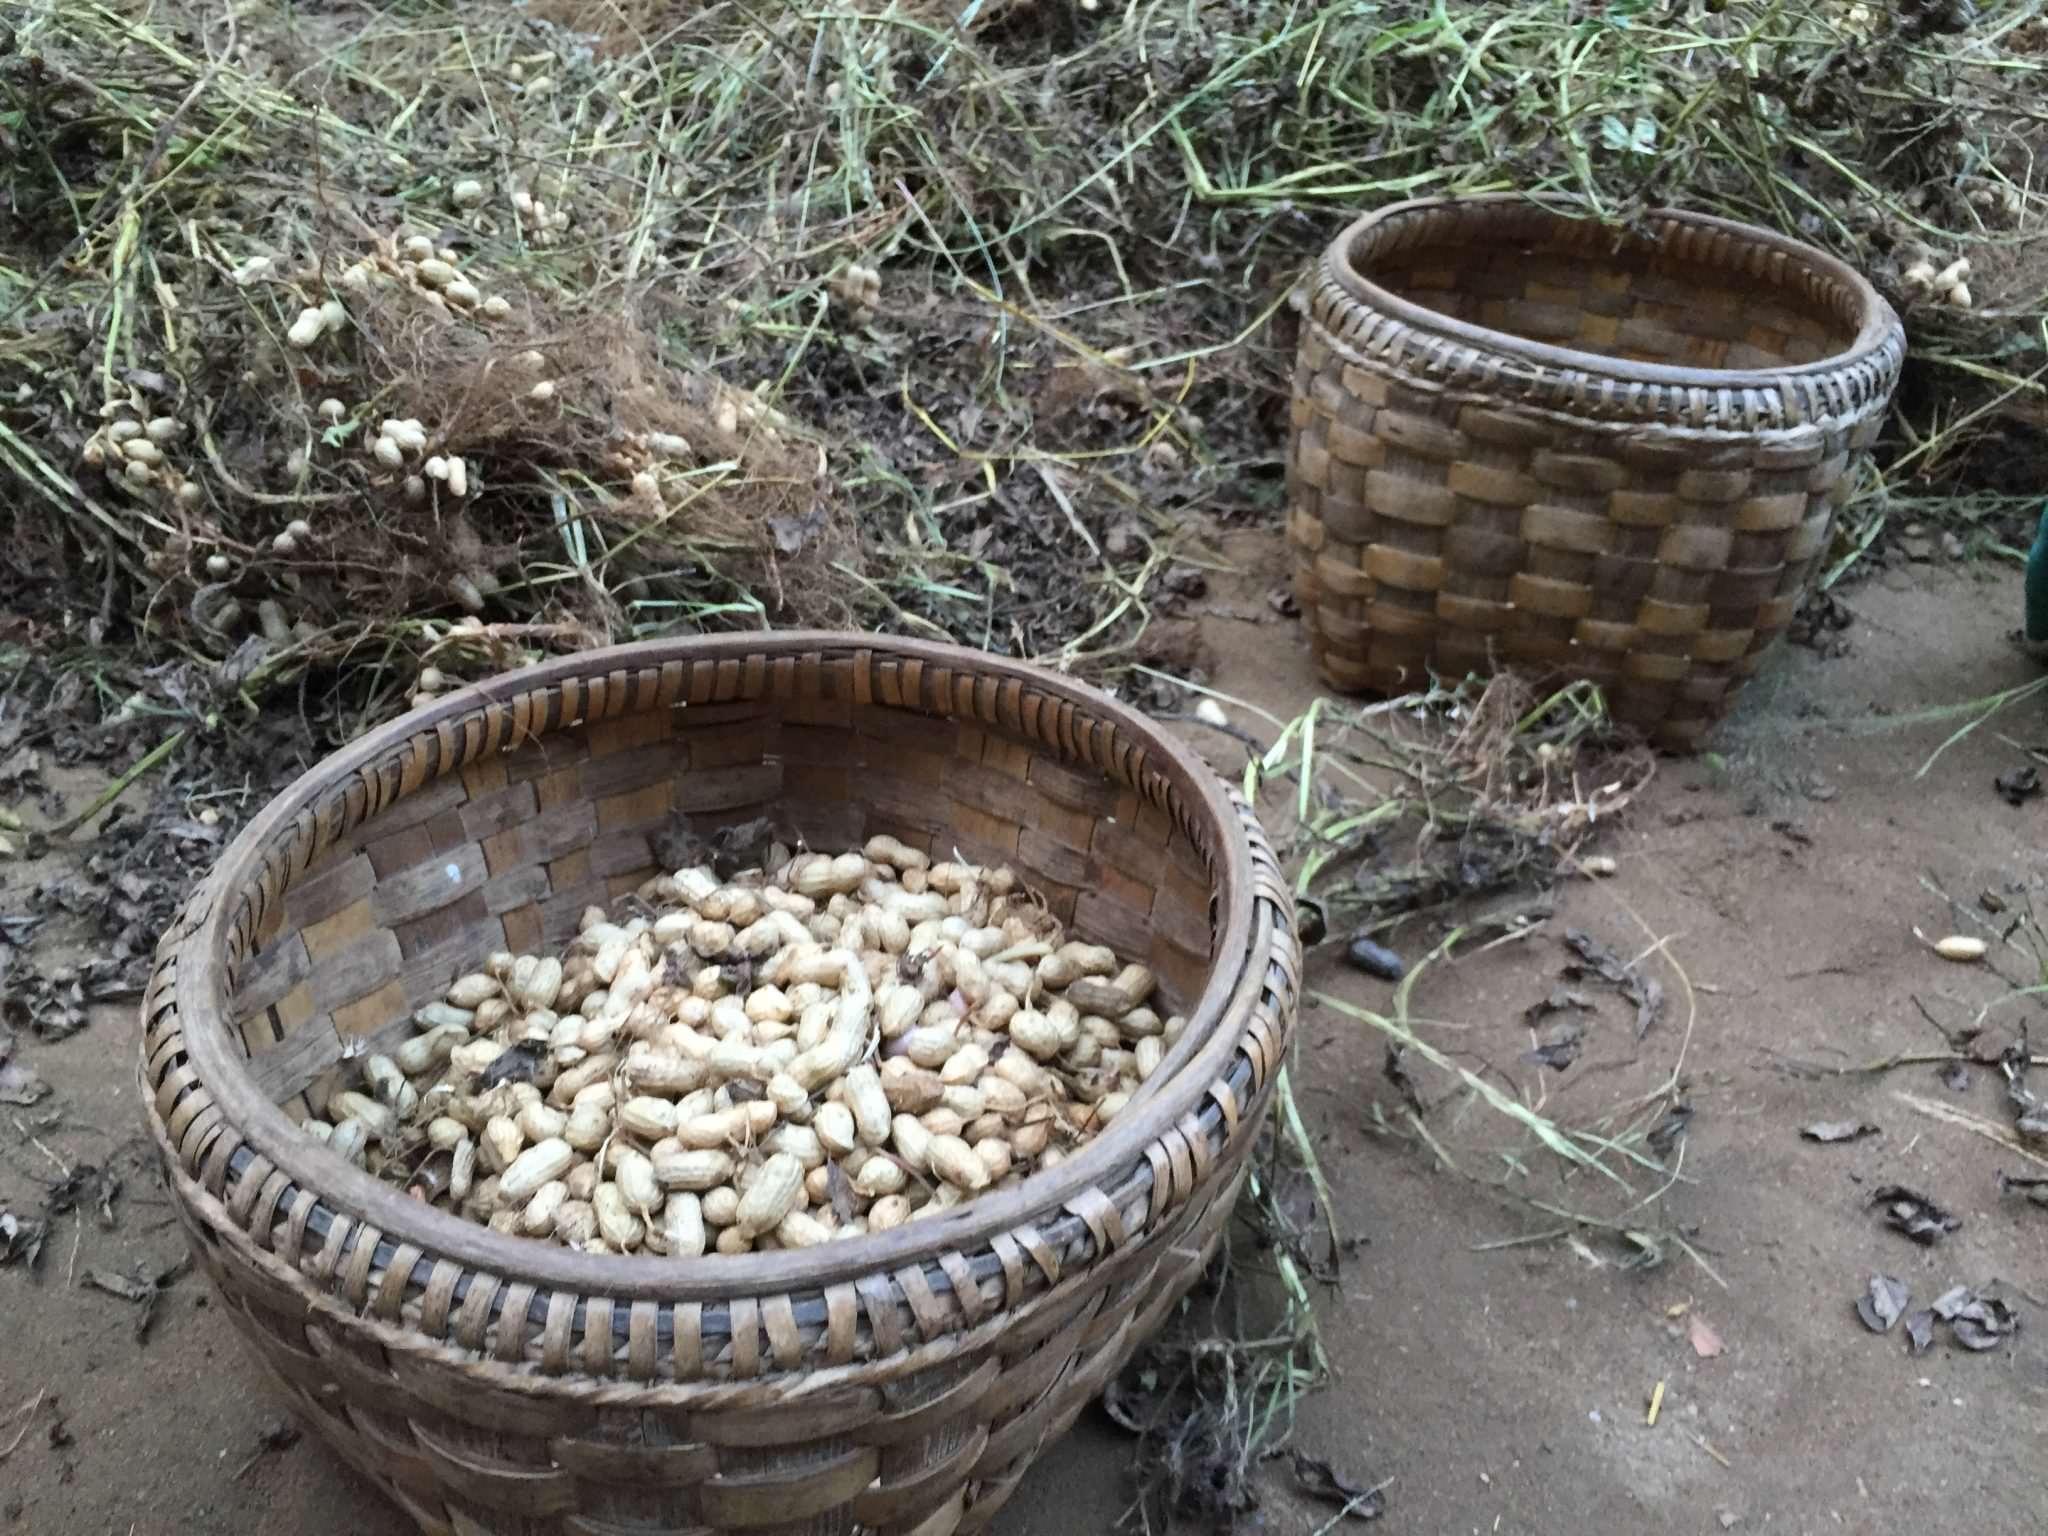 Every women had near her one woven bamboo basket for shells, one woven bamboo basket for the nut. © 2015 Gail Jessen